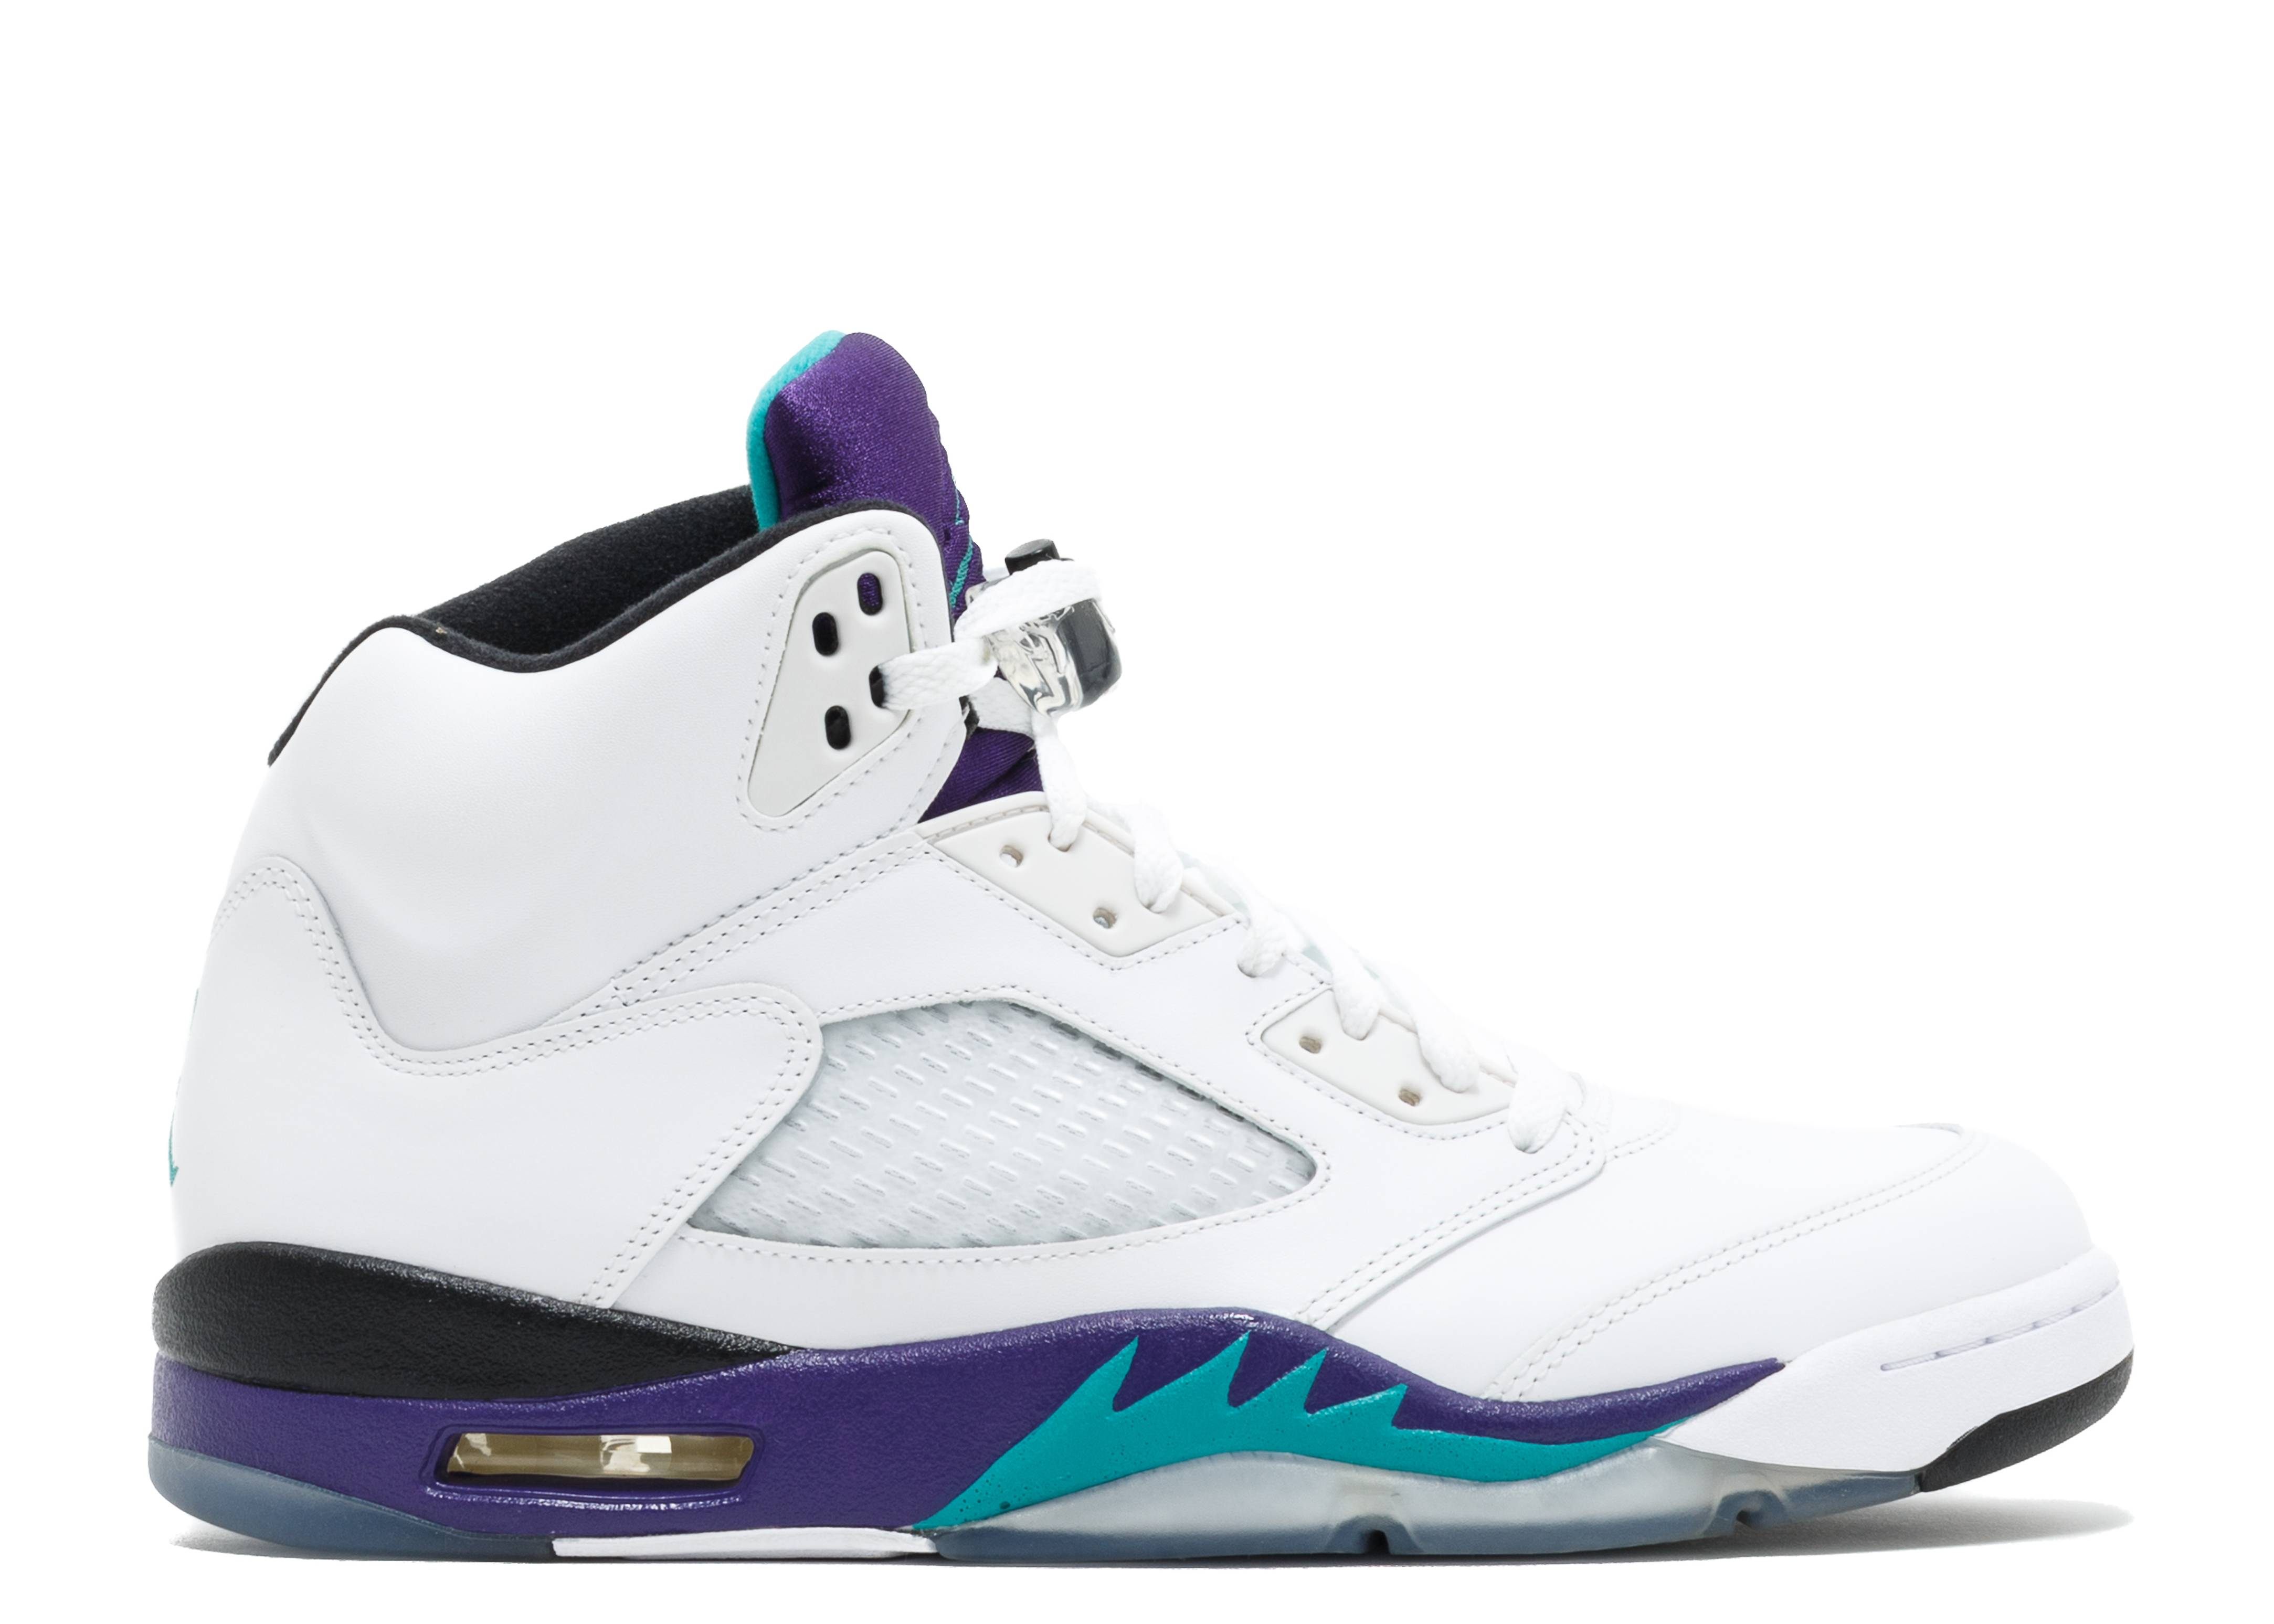 91464238af51 Air Jordan 5 Retro